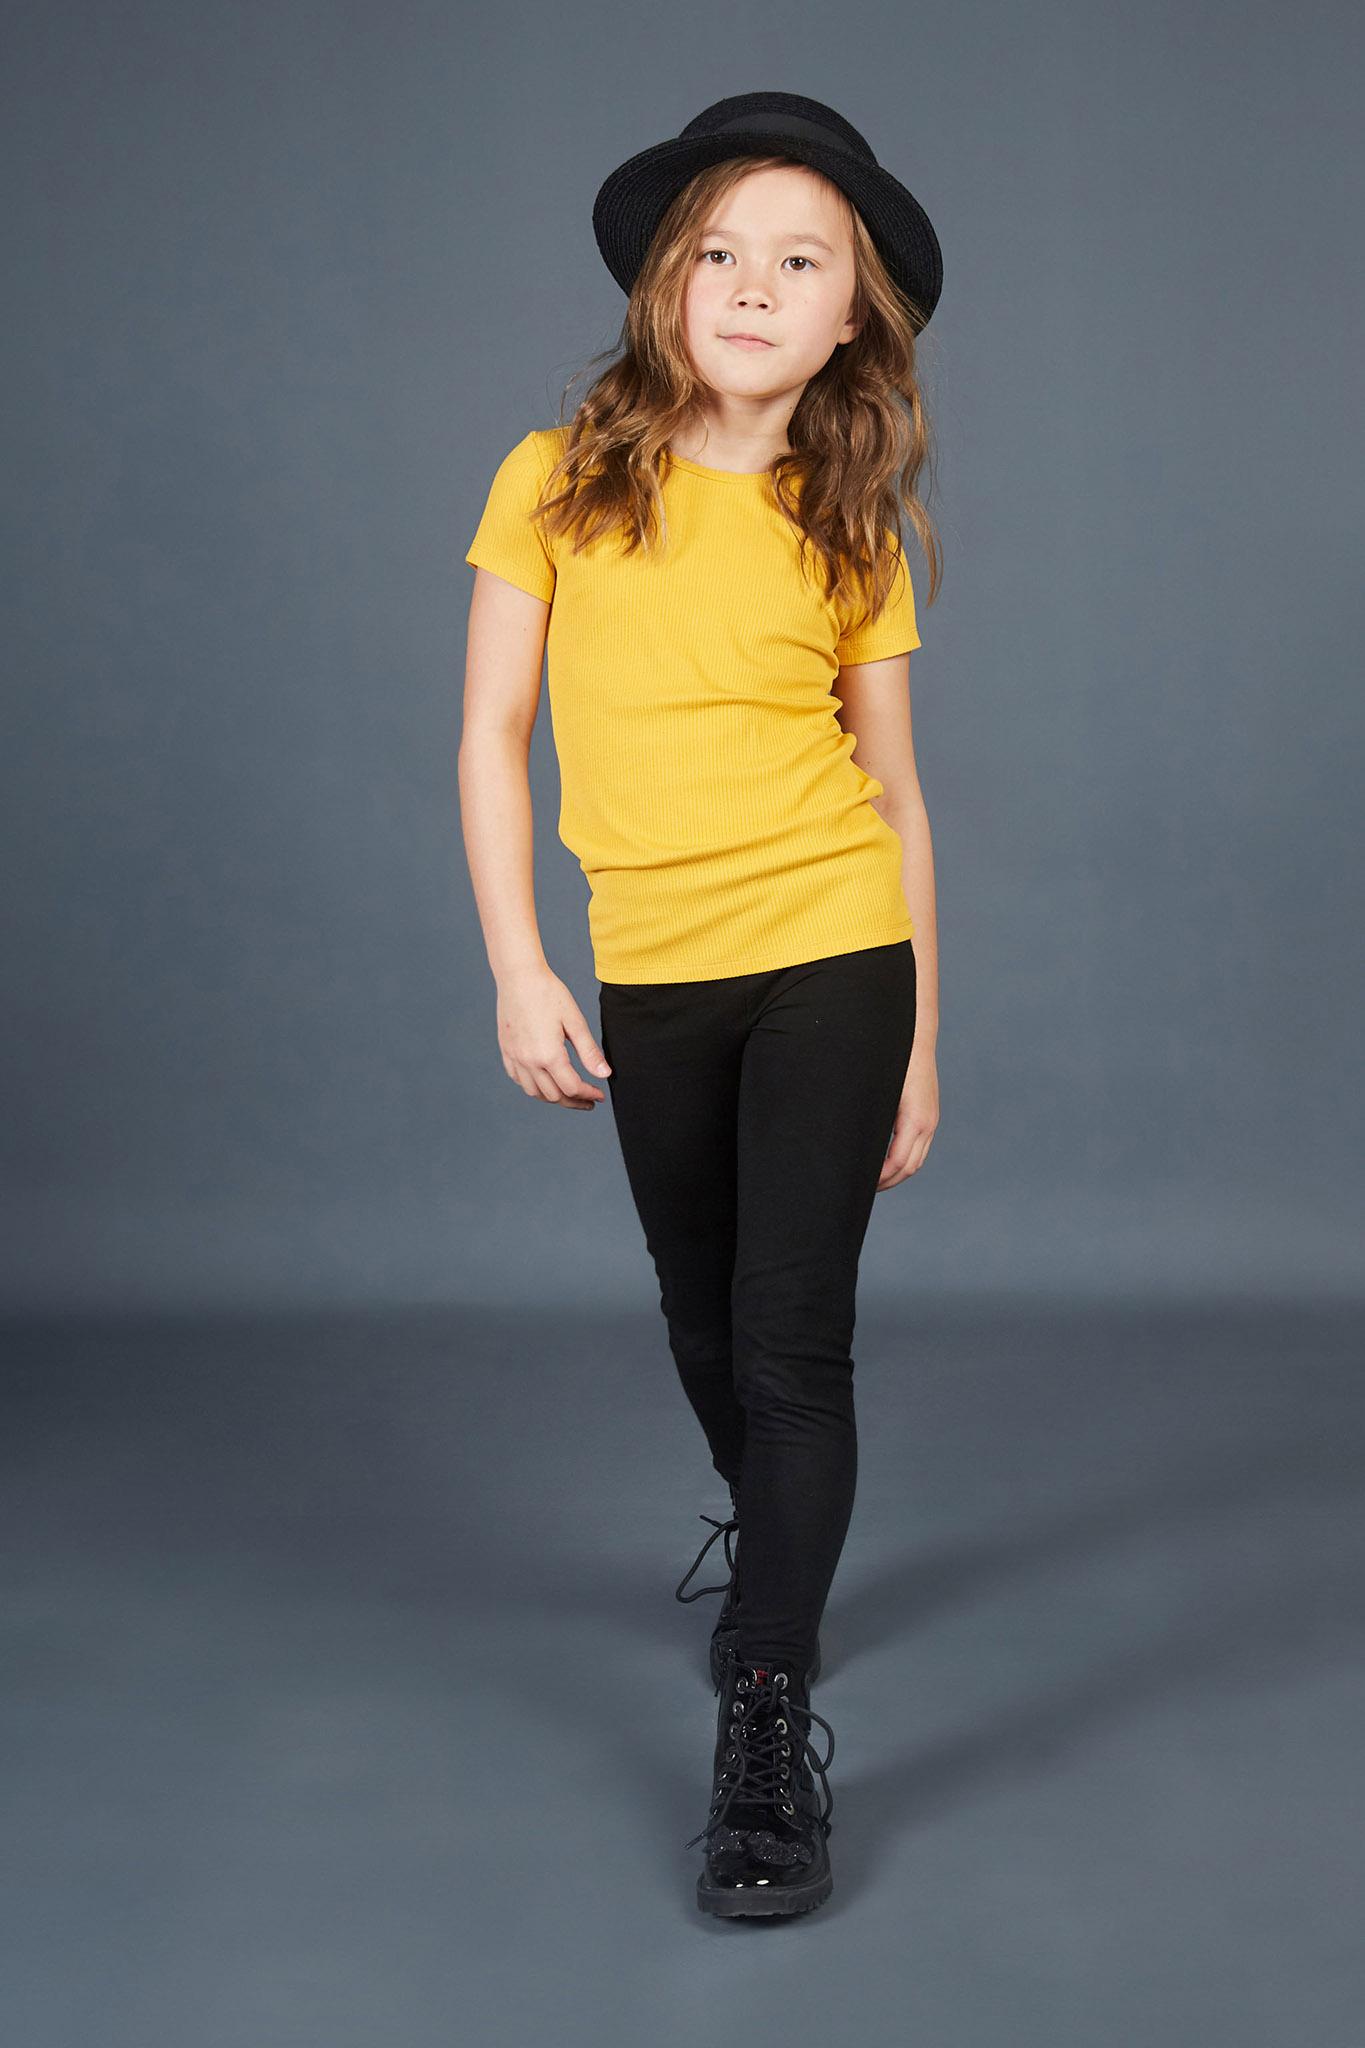 kids-catalog-photography-the-jersey-shop-4